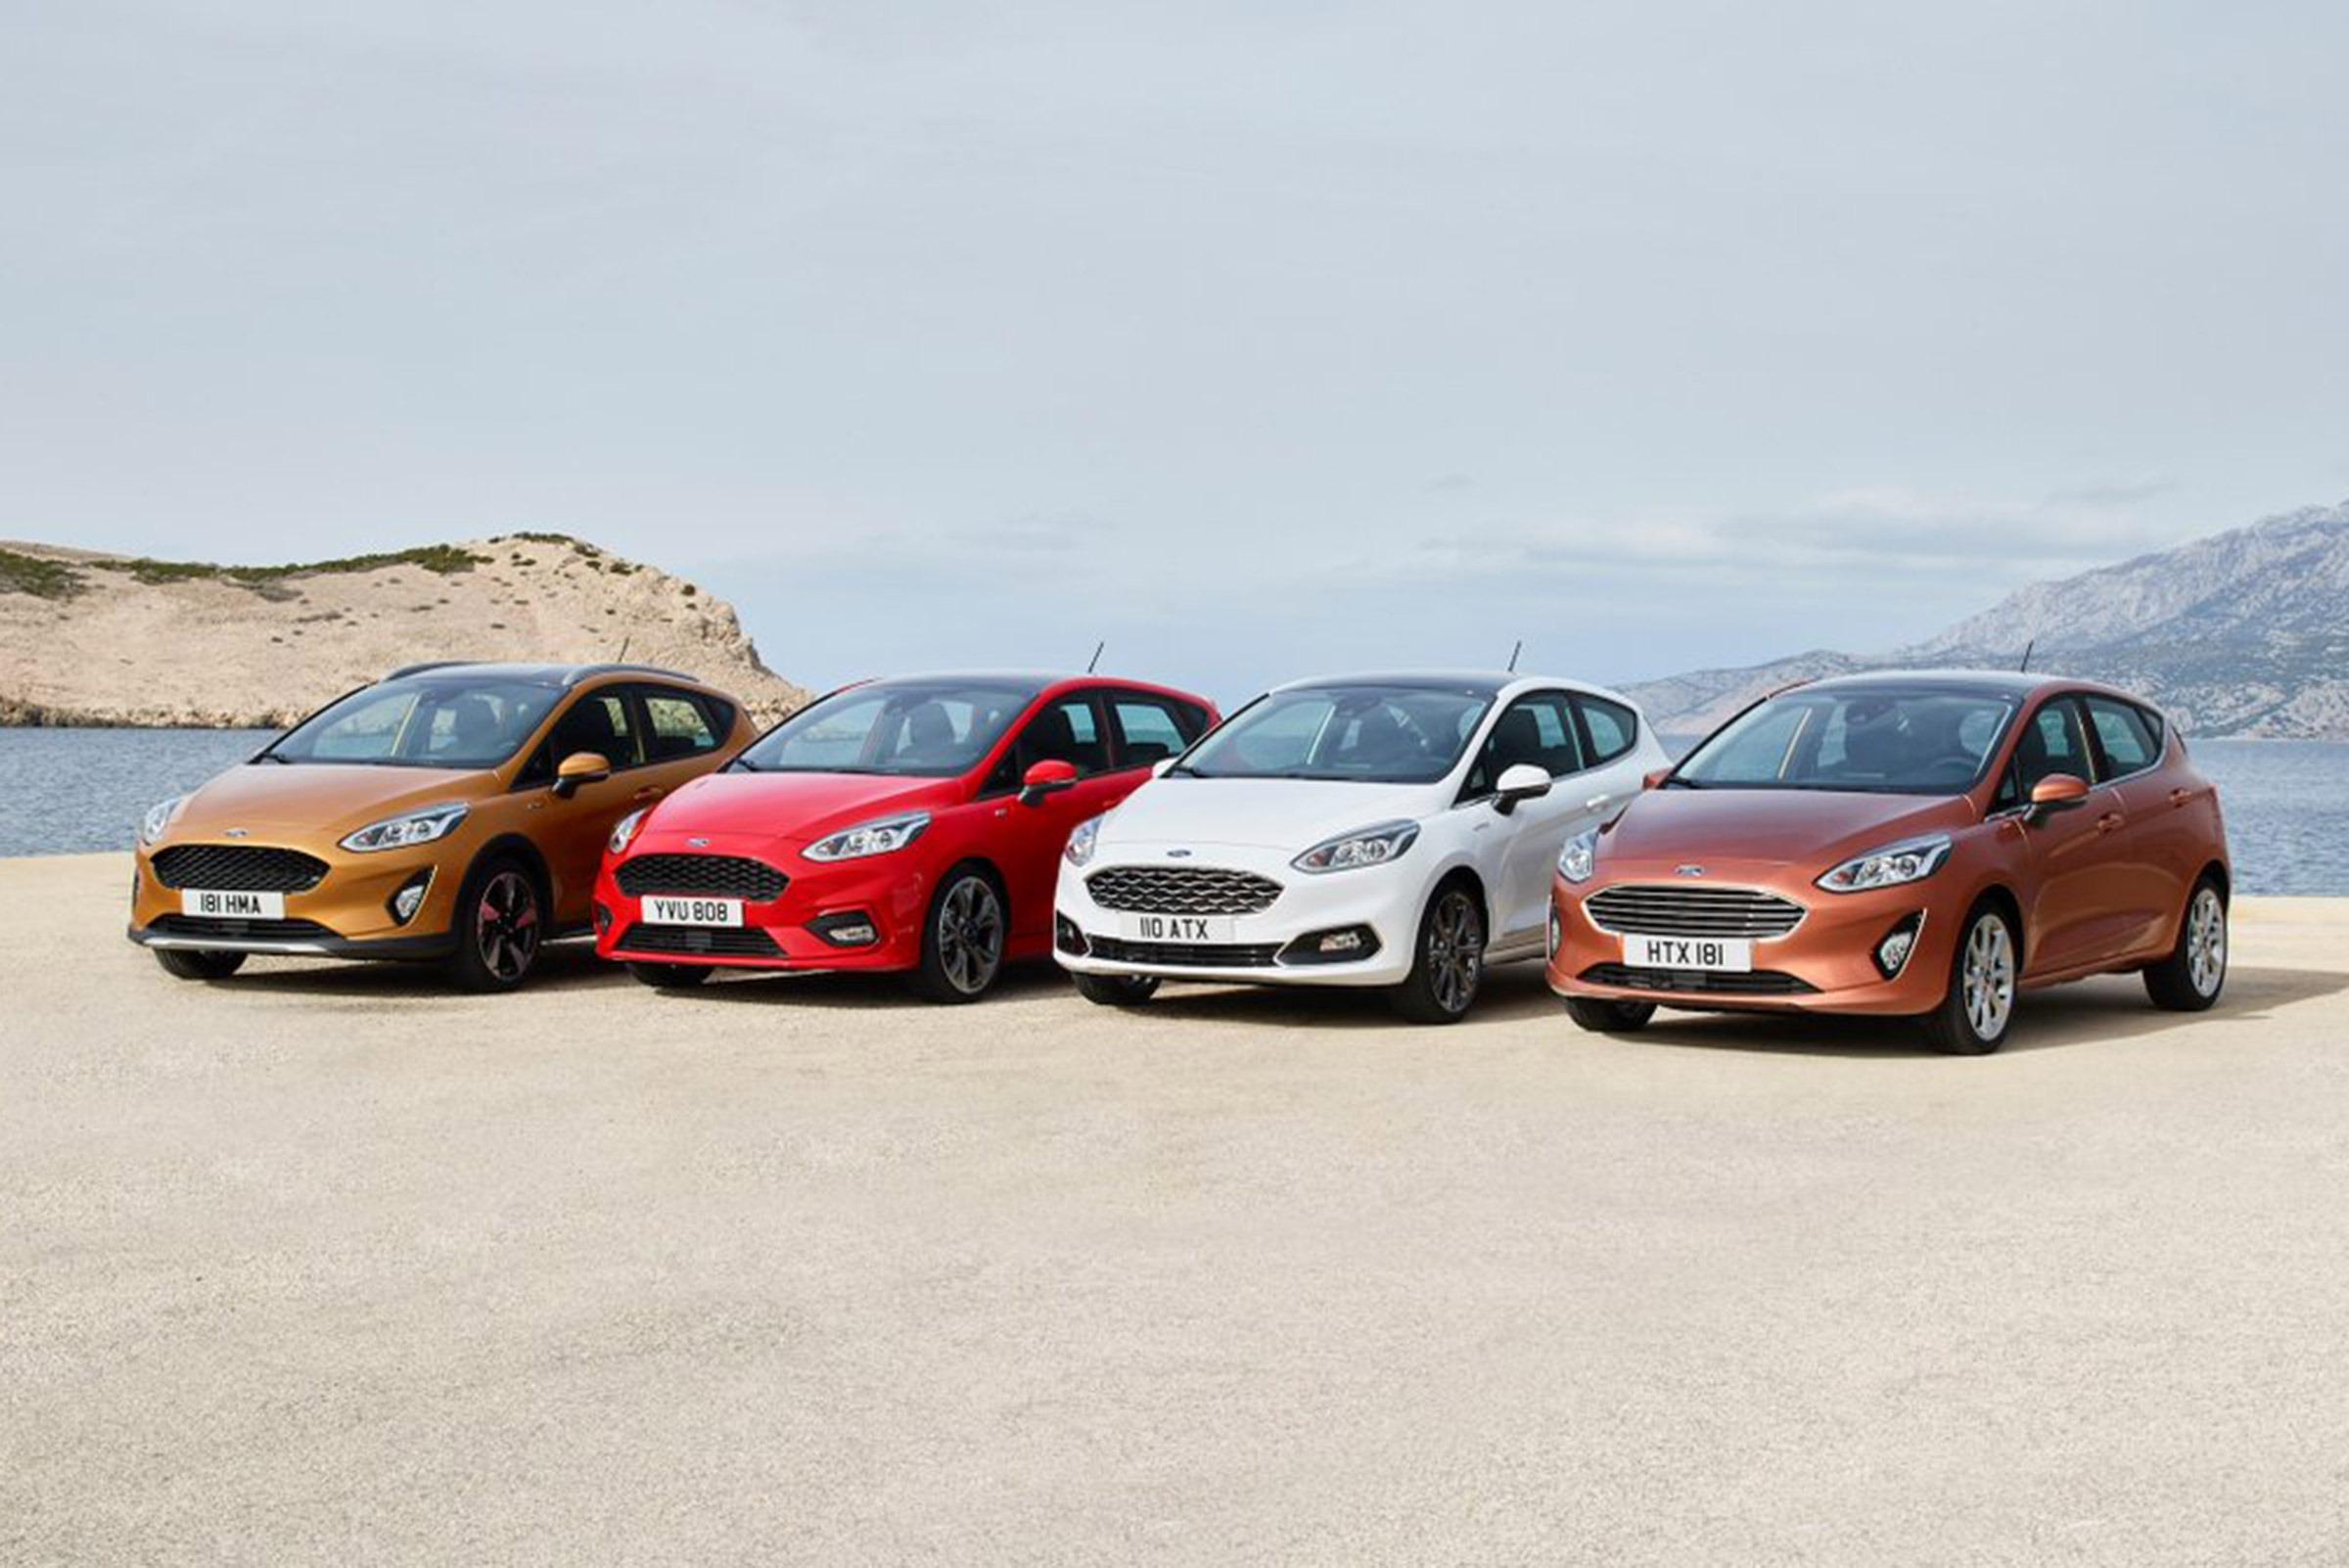 Nova Ford Fiesta u prodaji od 8. avgusta (promotivna vest)